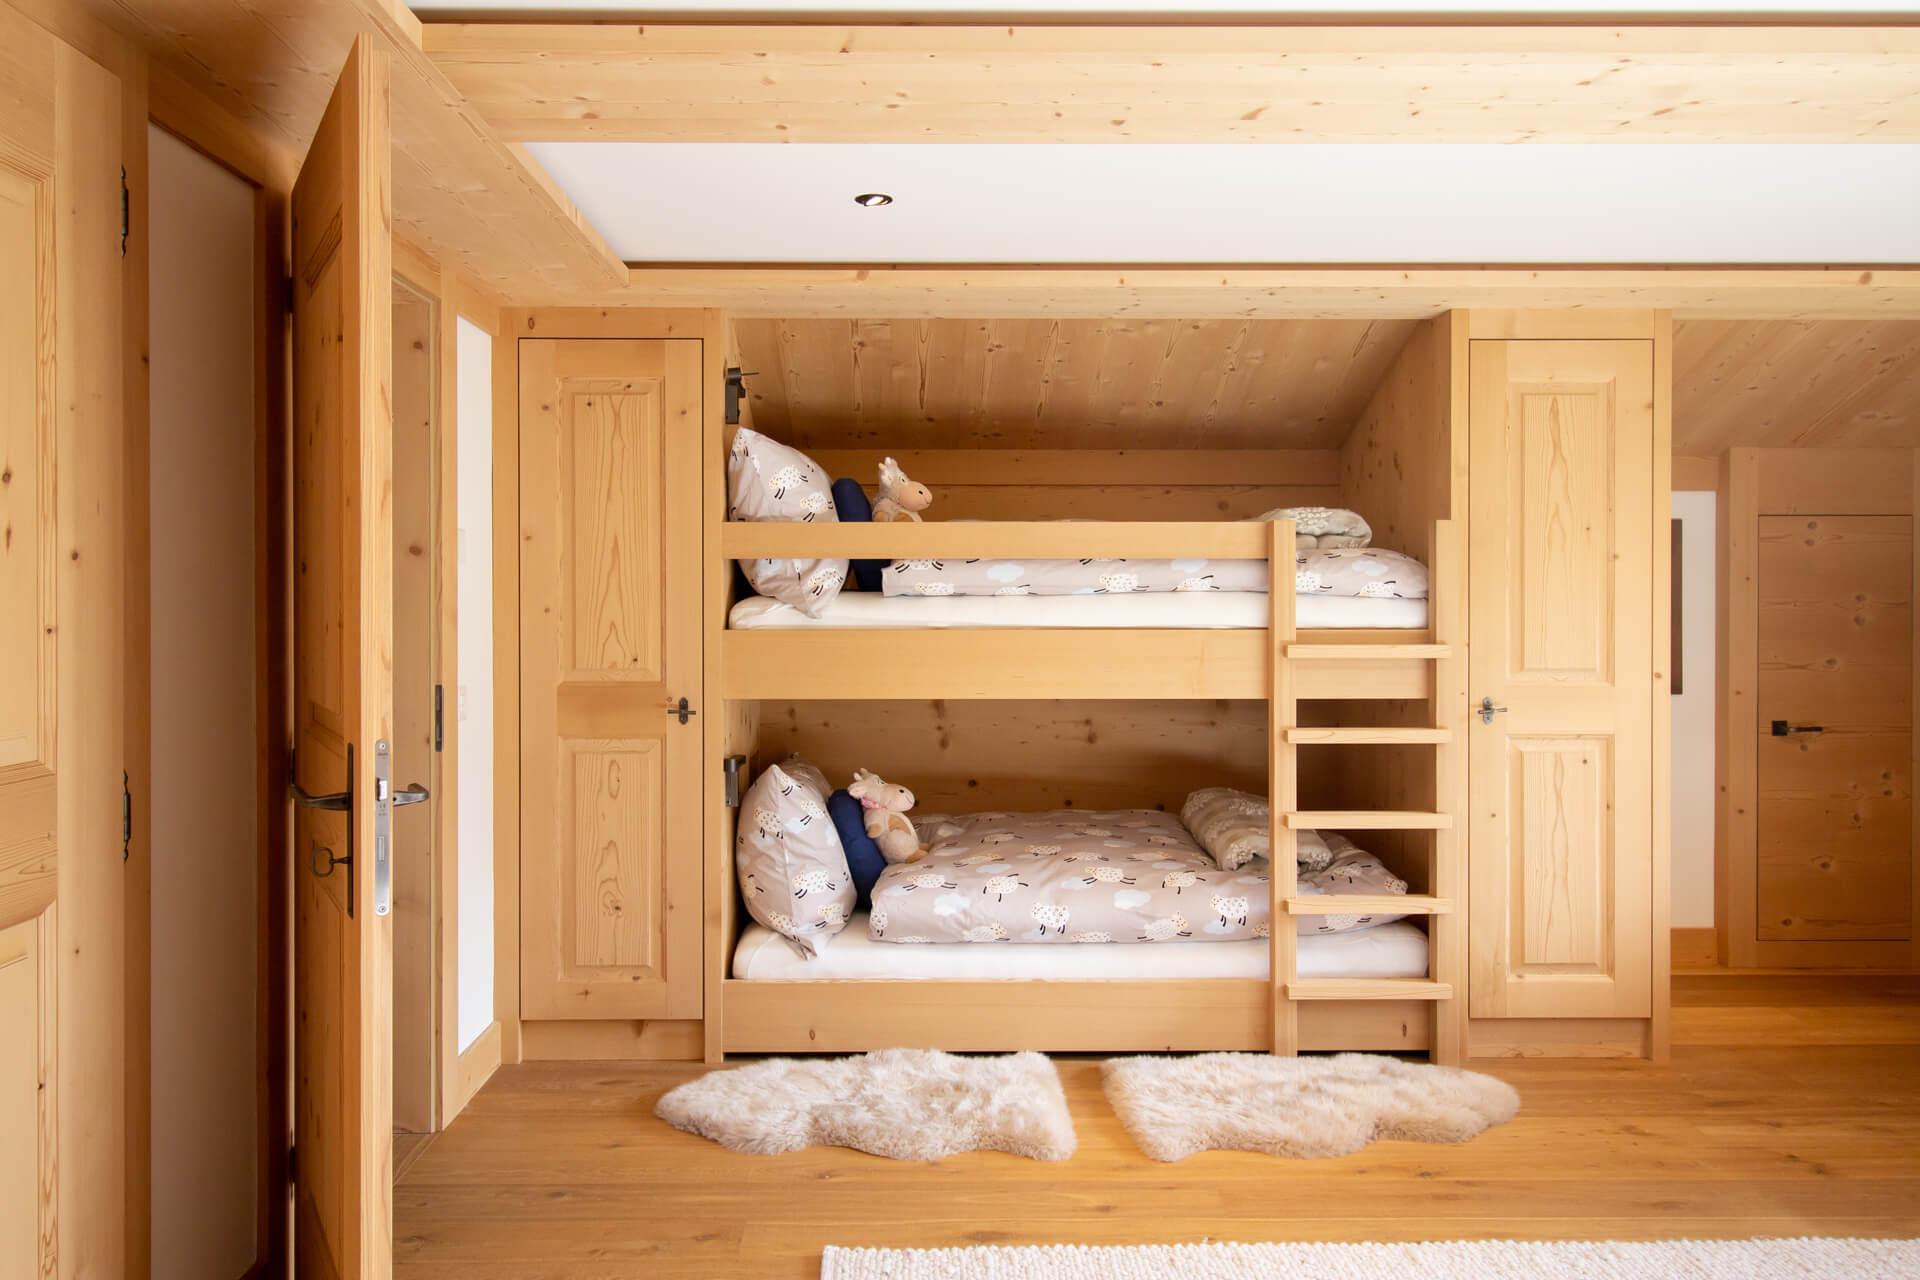 https://fsw-kreatektur.ch/wp-content/uploads/Fsw-Kreatektur-Architektur-Umbau-Lauenen-Kinderbett-Etagenbett-tiny-1.jpg